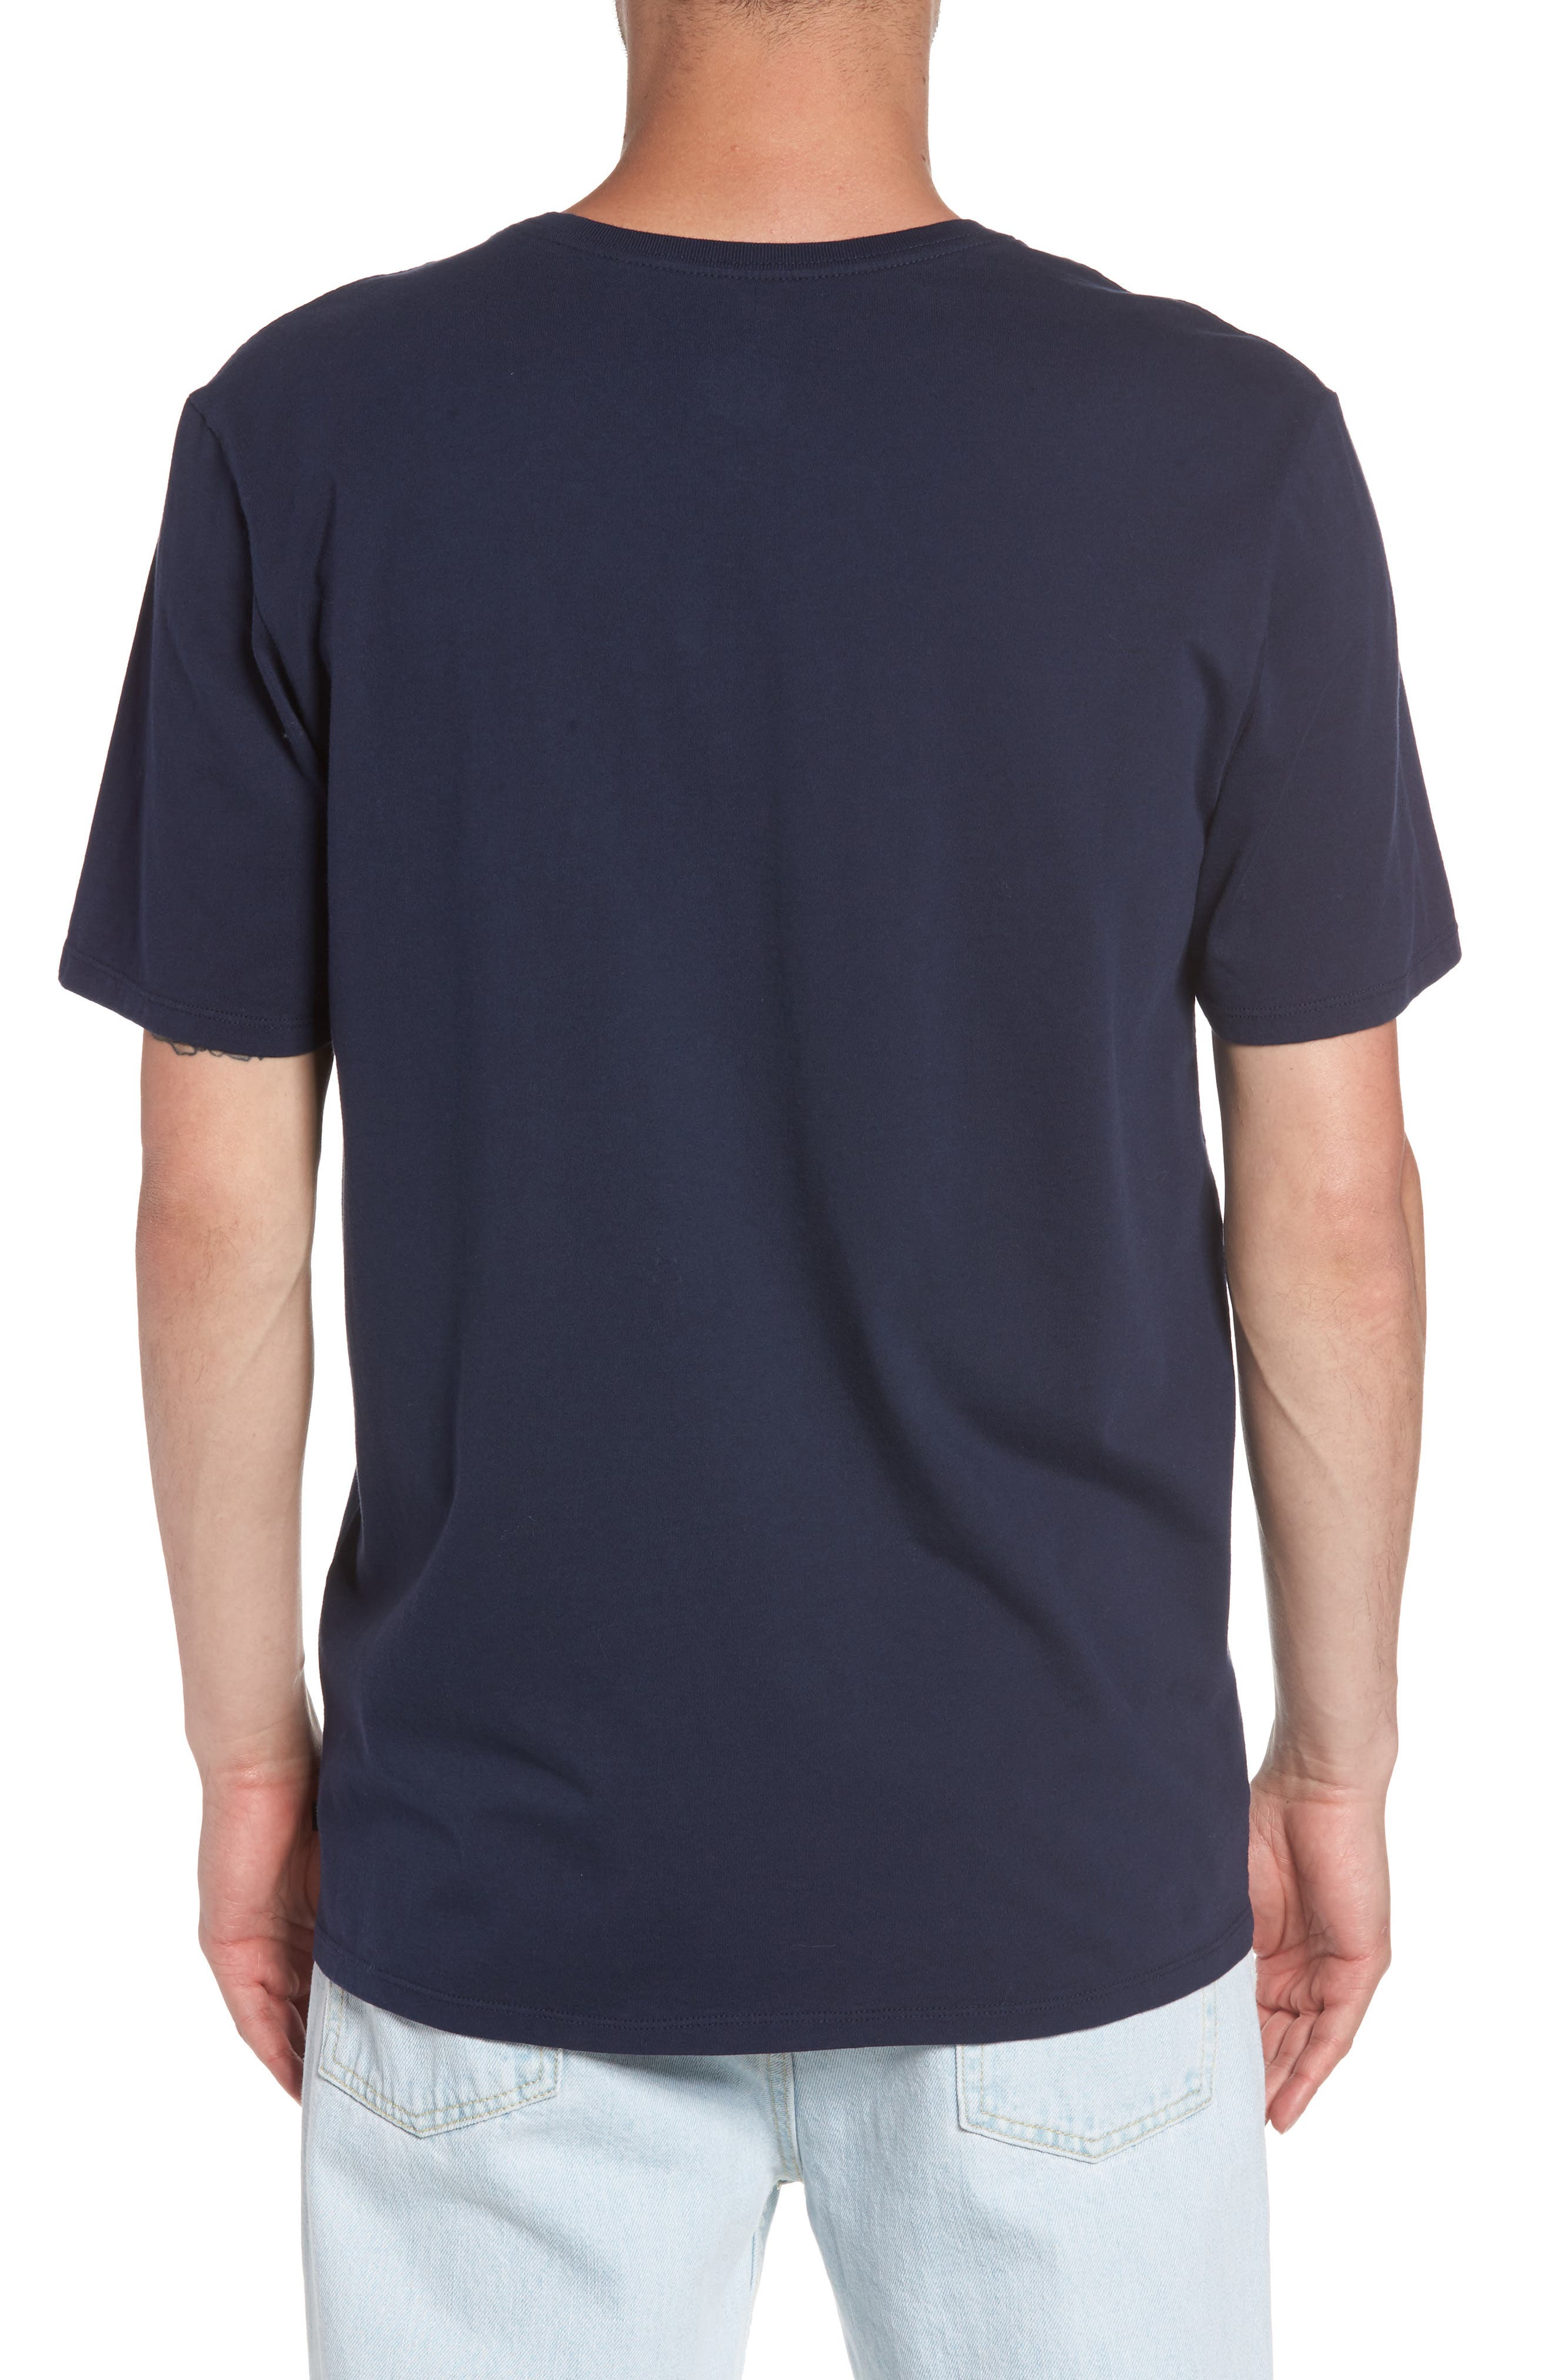 Nike Sportswear Futura T-Shirt,                             Alternate thumbnail 2, color,                             Obsidian